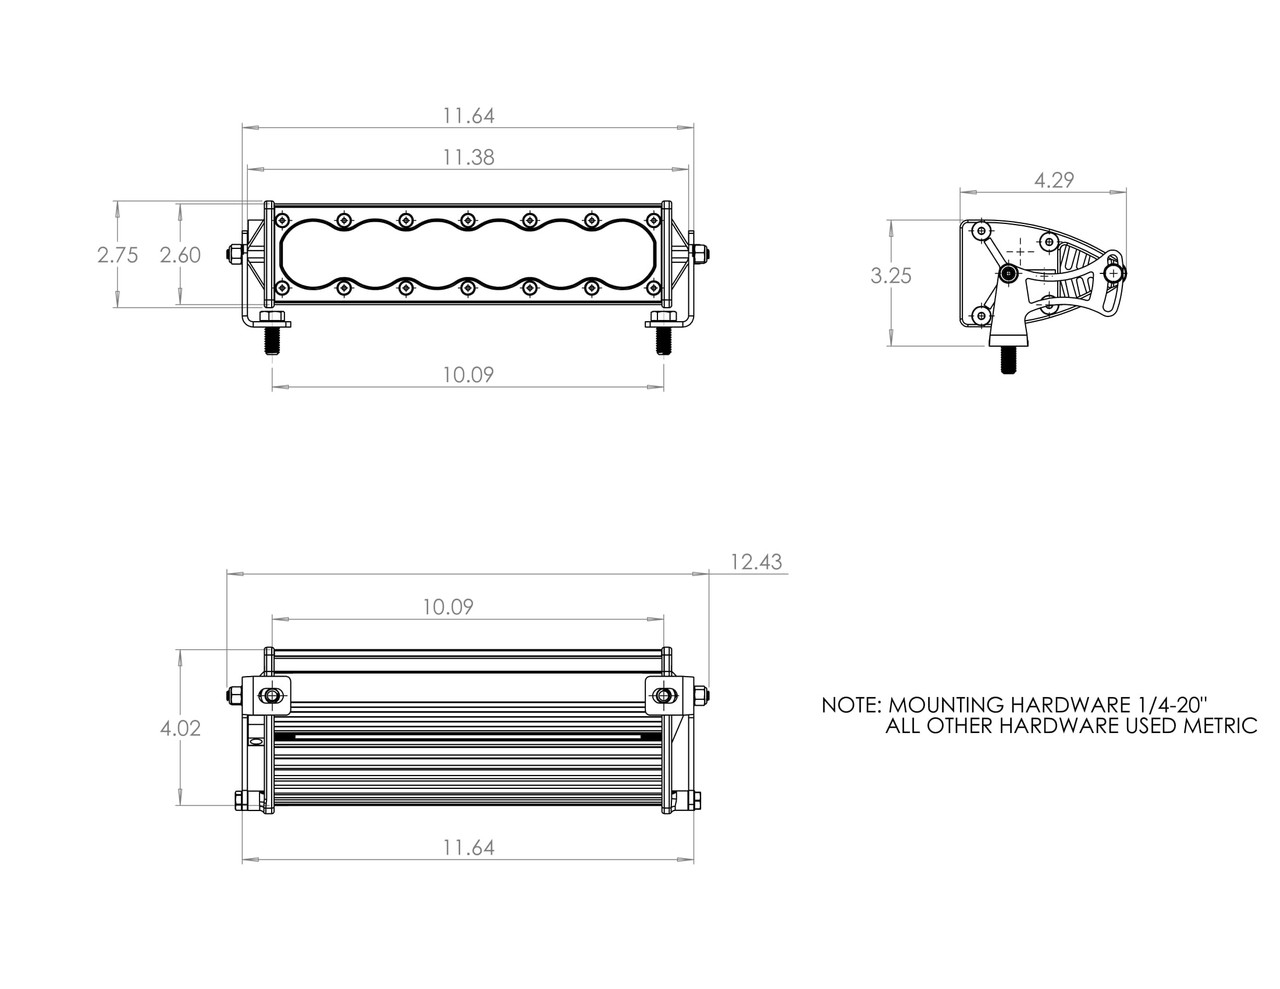 OnX6, Racer Edition, LED Light Bars